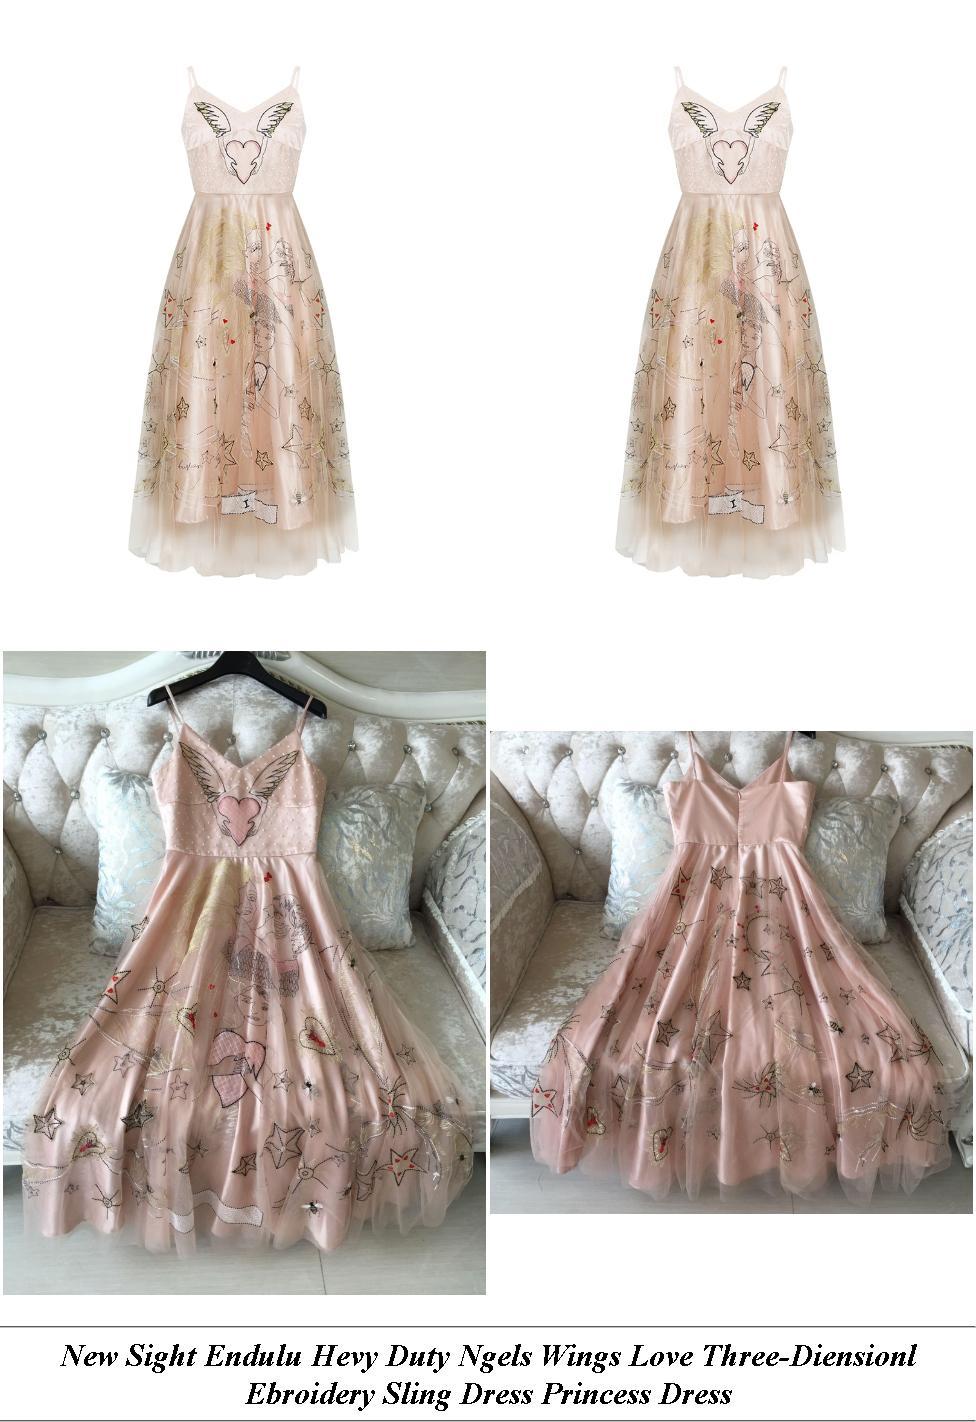 Satin Dress Uy Online - Winter Jackets Price Toronto - Womens Fashion Stores Near Me